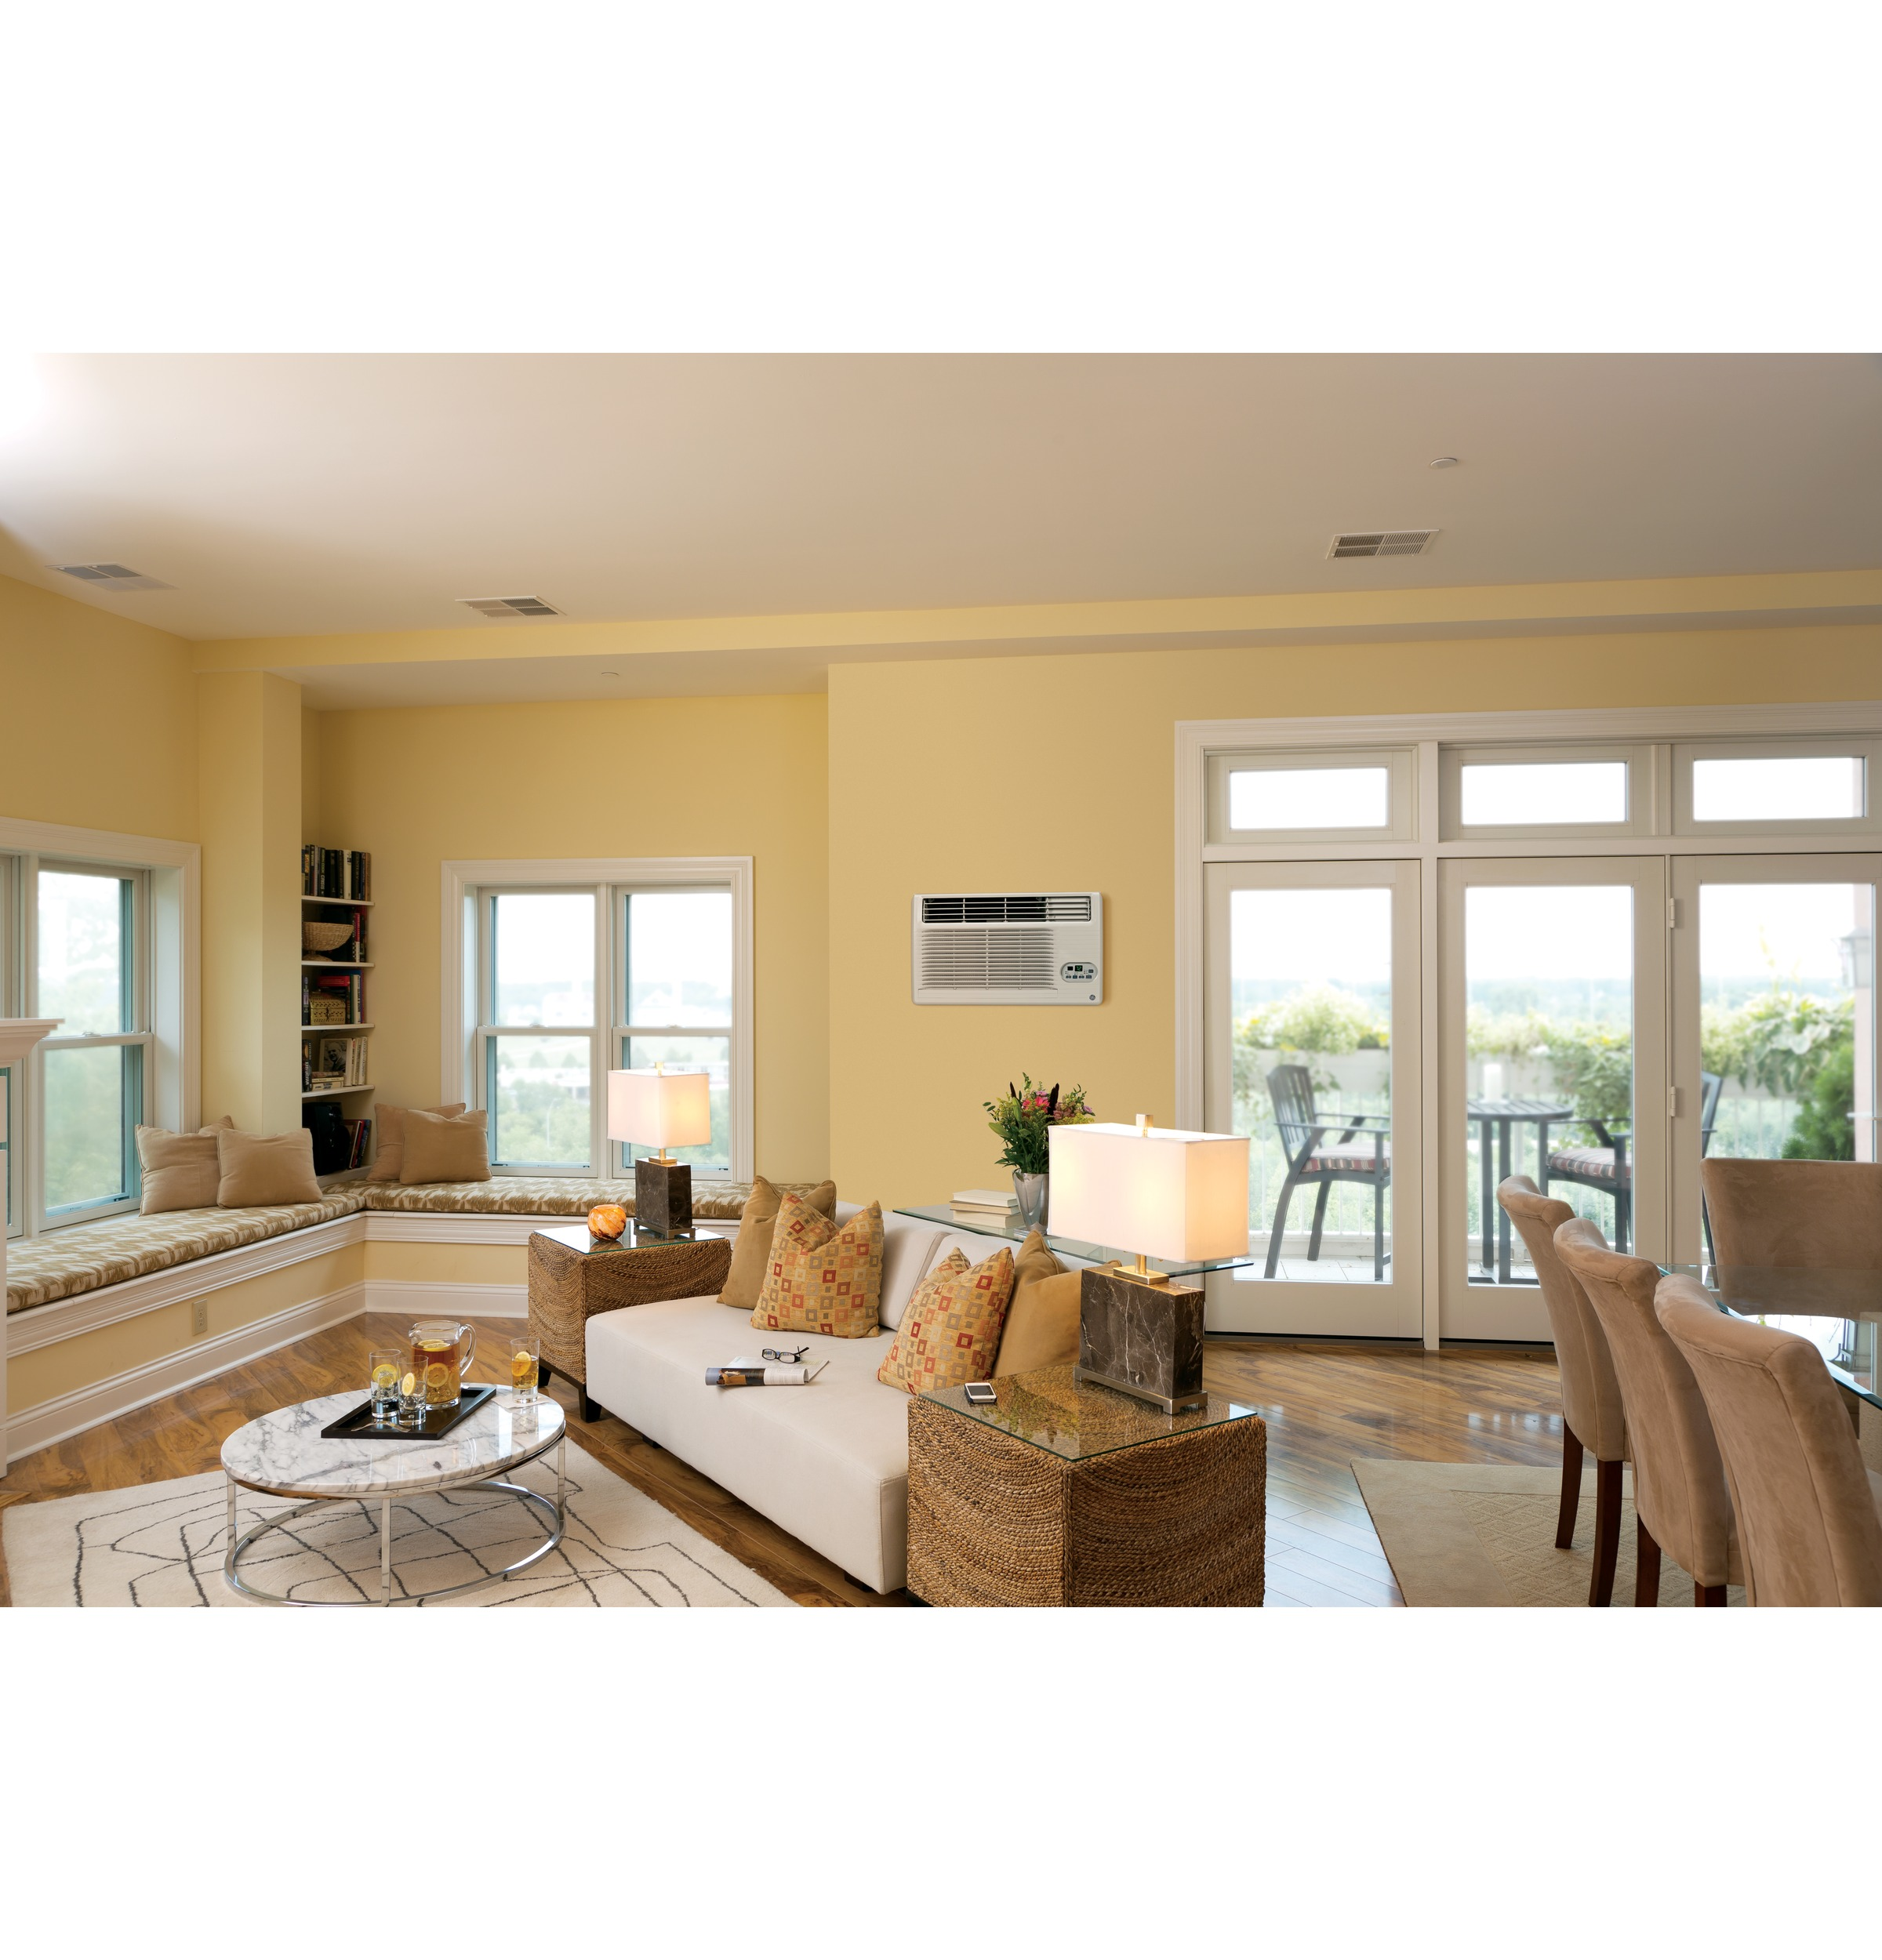 Model: AJEM12DCF | GE GE® 230/208 Volt Built-In Heat/Cool Room Air Conditioner